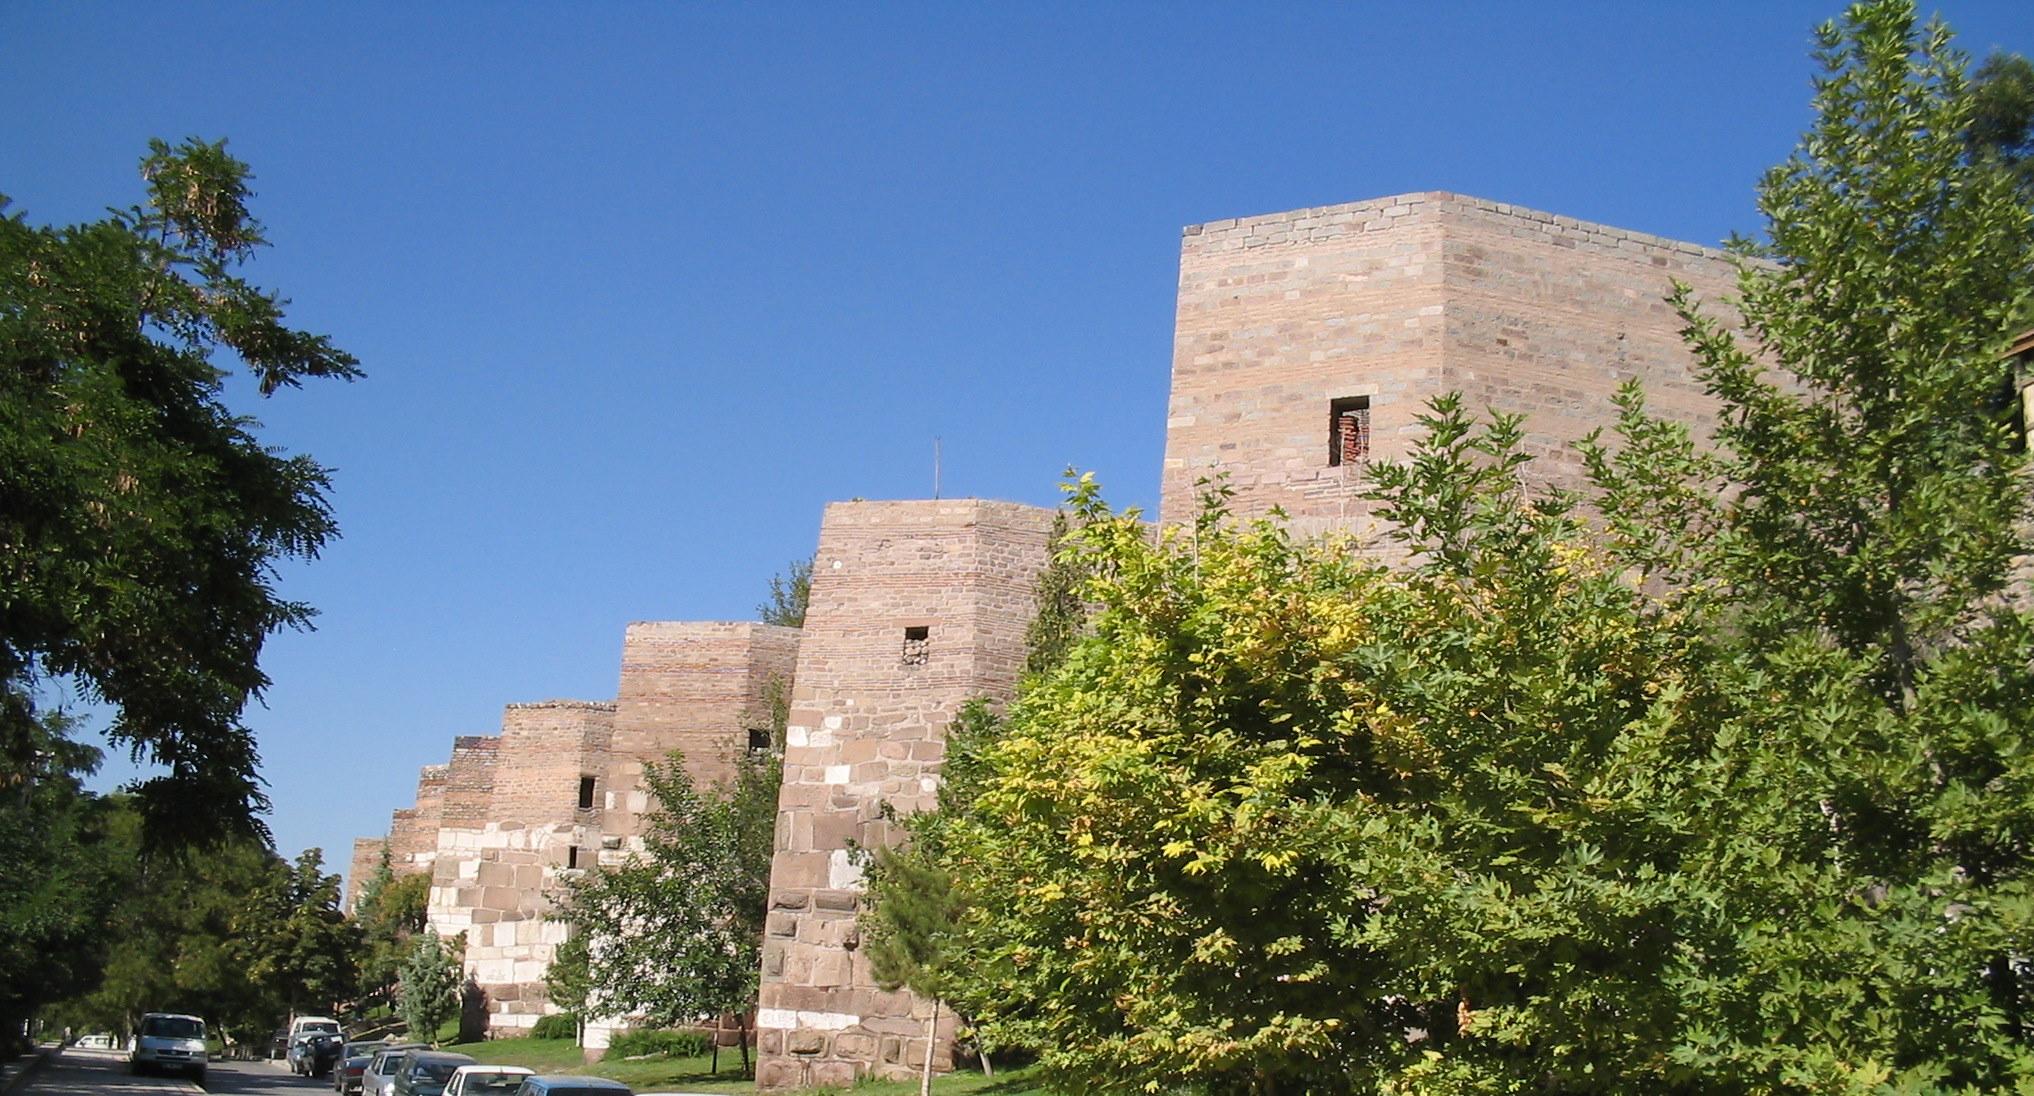 File:Ankara Castle walls.JPG - Wikimedia Commons